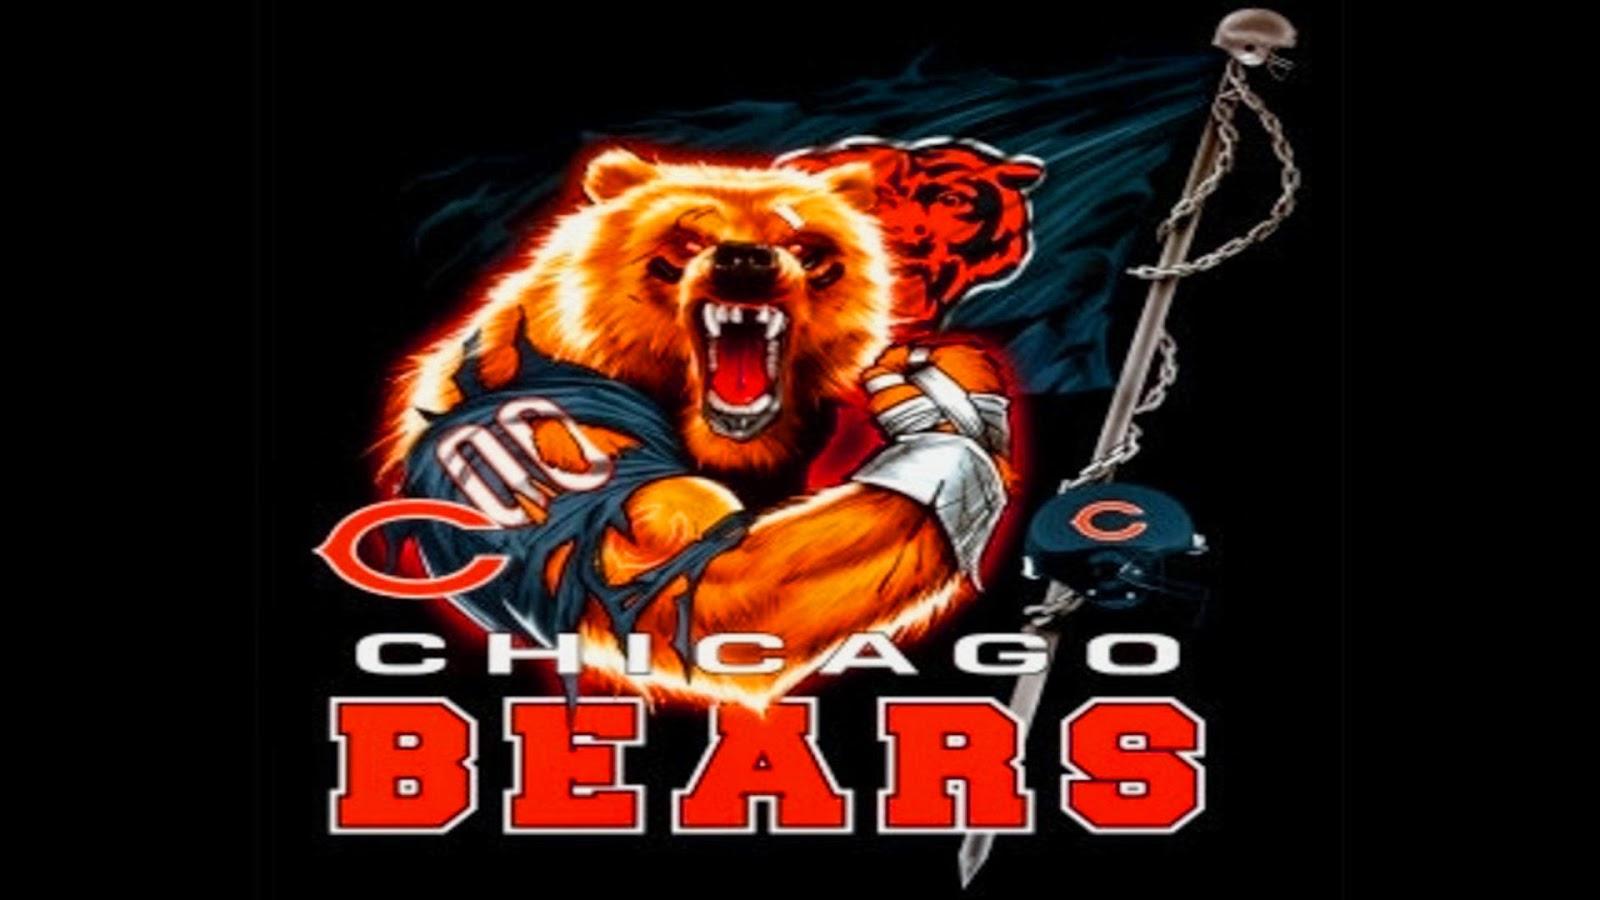 Chicago Bears Football HD Wallpaper HD Wallpaper Movie 1600x900